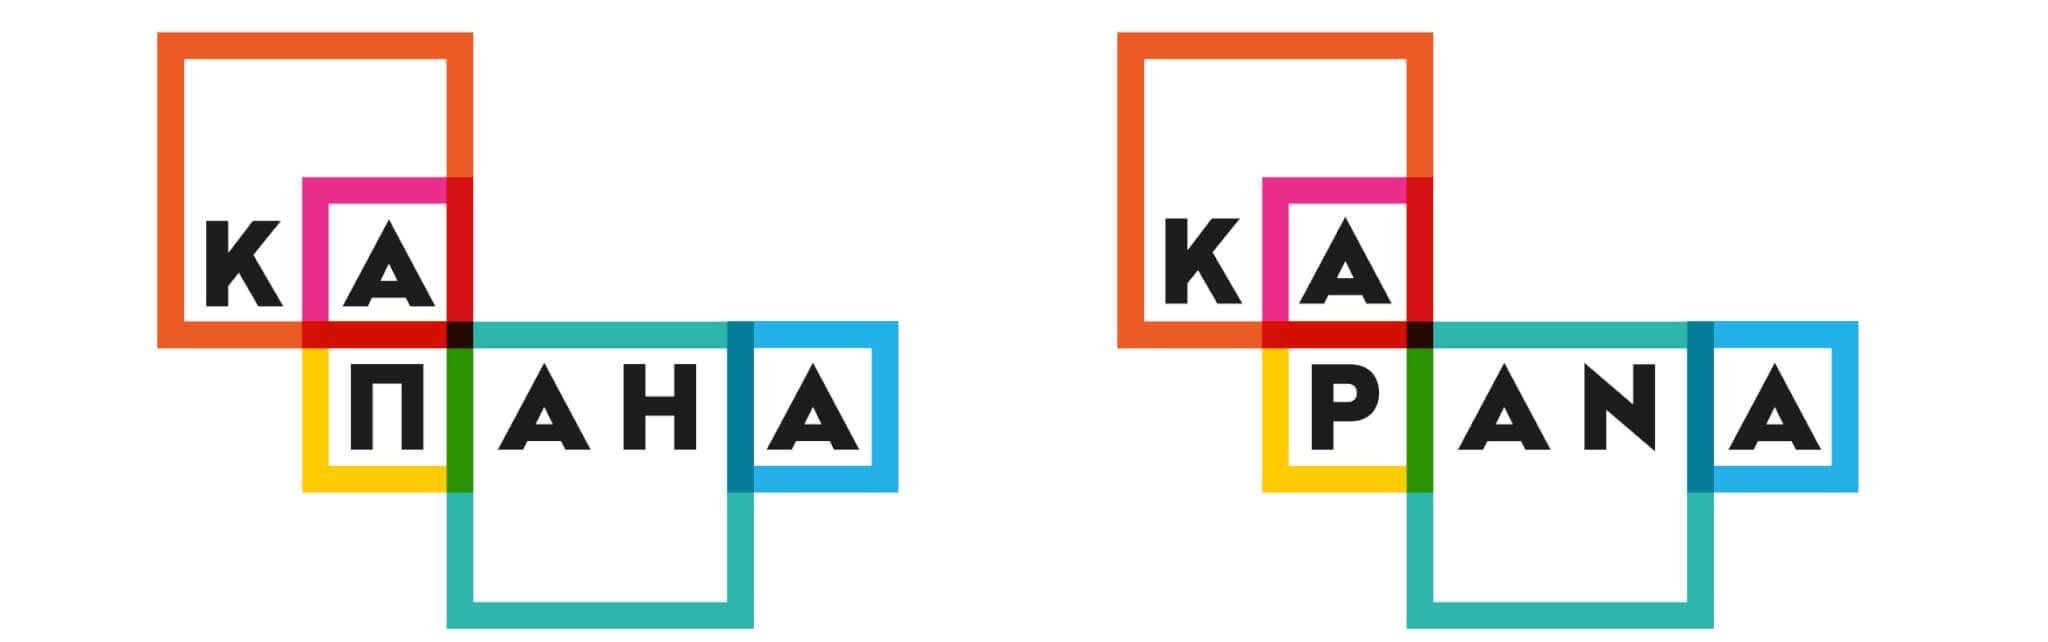 ABSOLUT KAPANA Logo 02